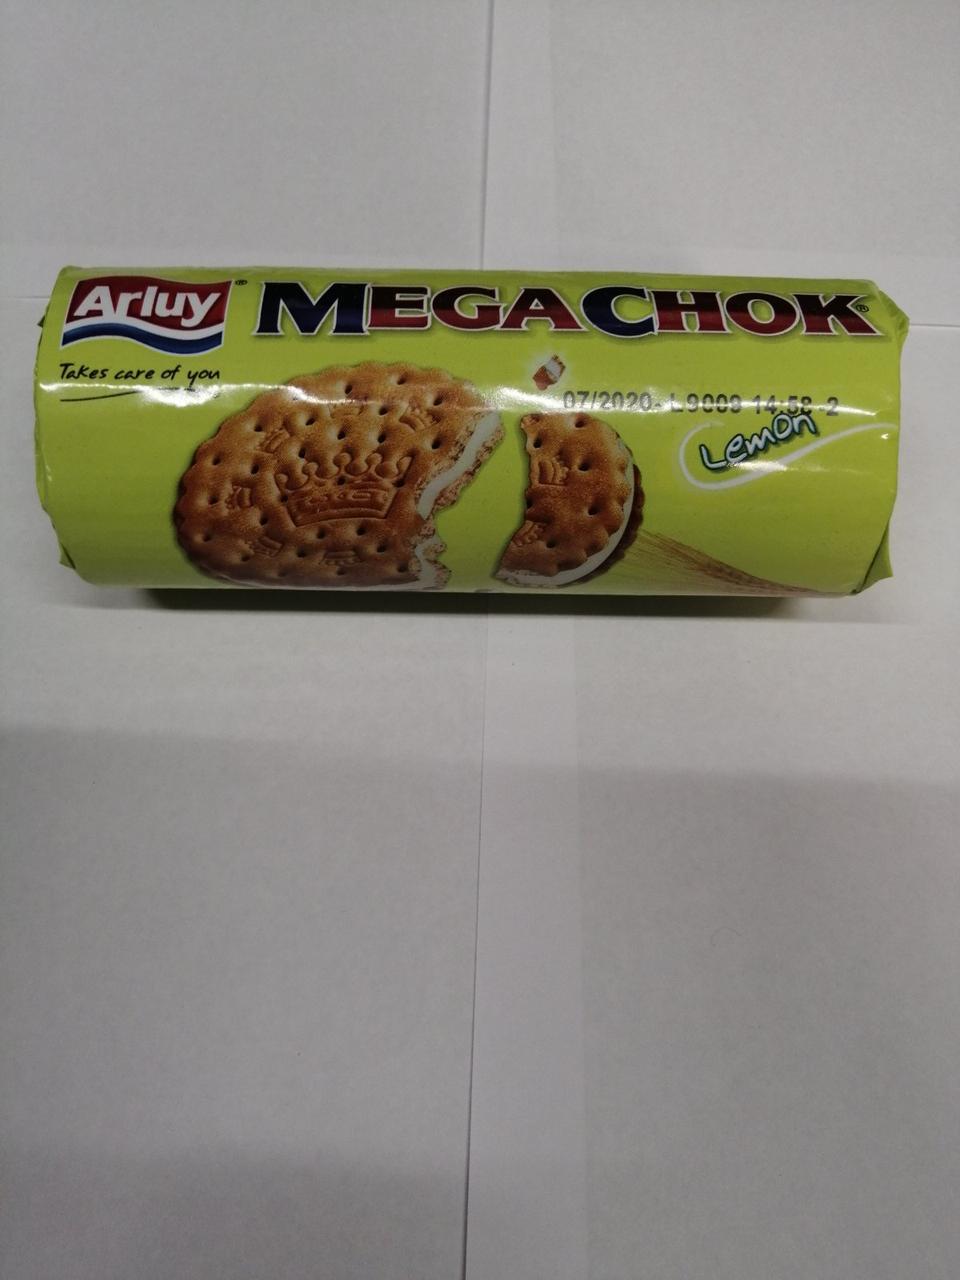 Печенье Arluy Megachok Lemon, 180 г (Испания)